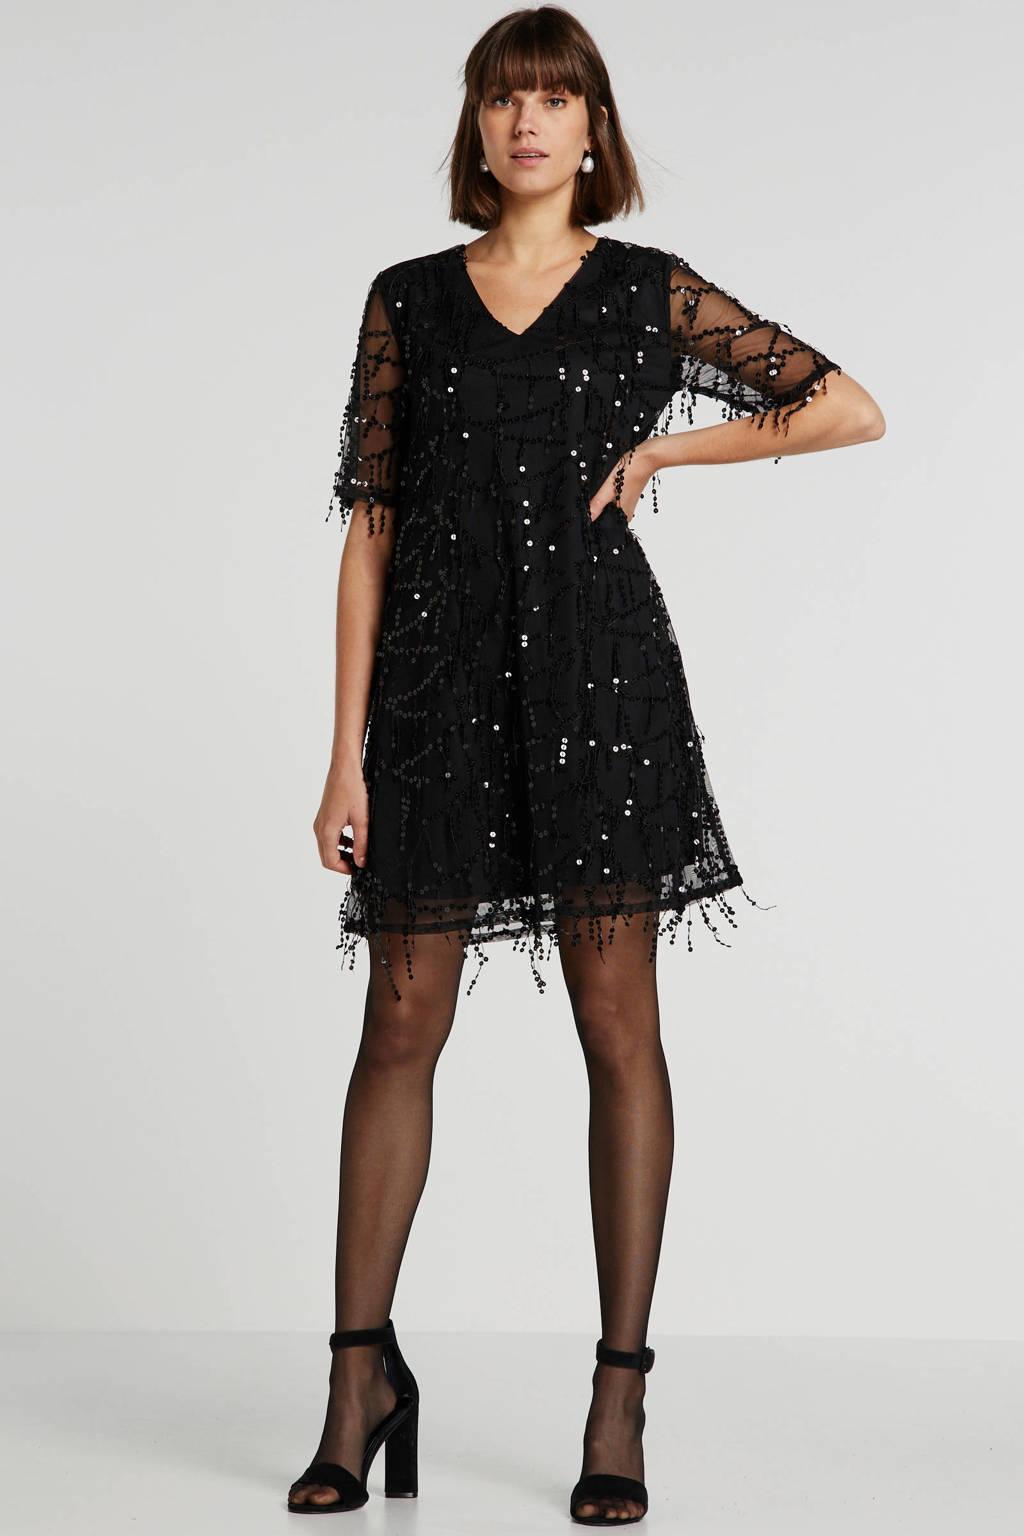 wehkamp mesh jurk met pailletten zwart, Zwart